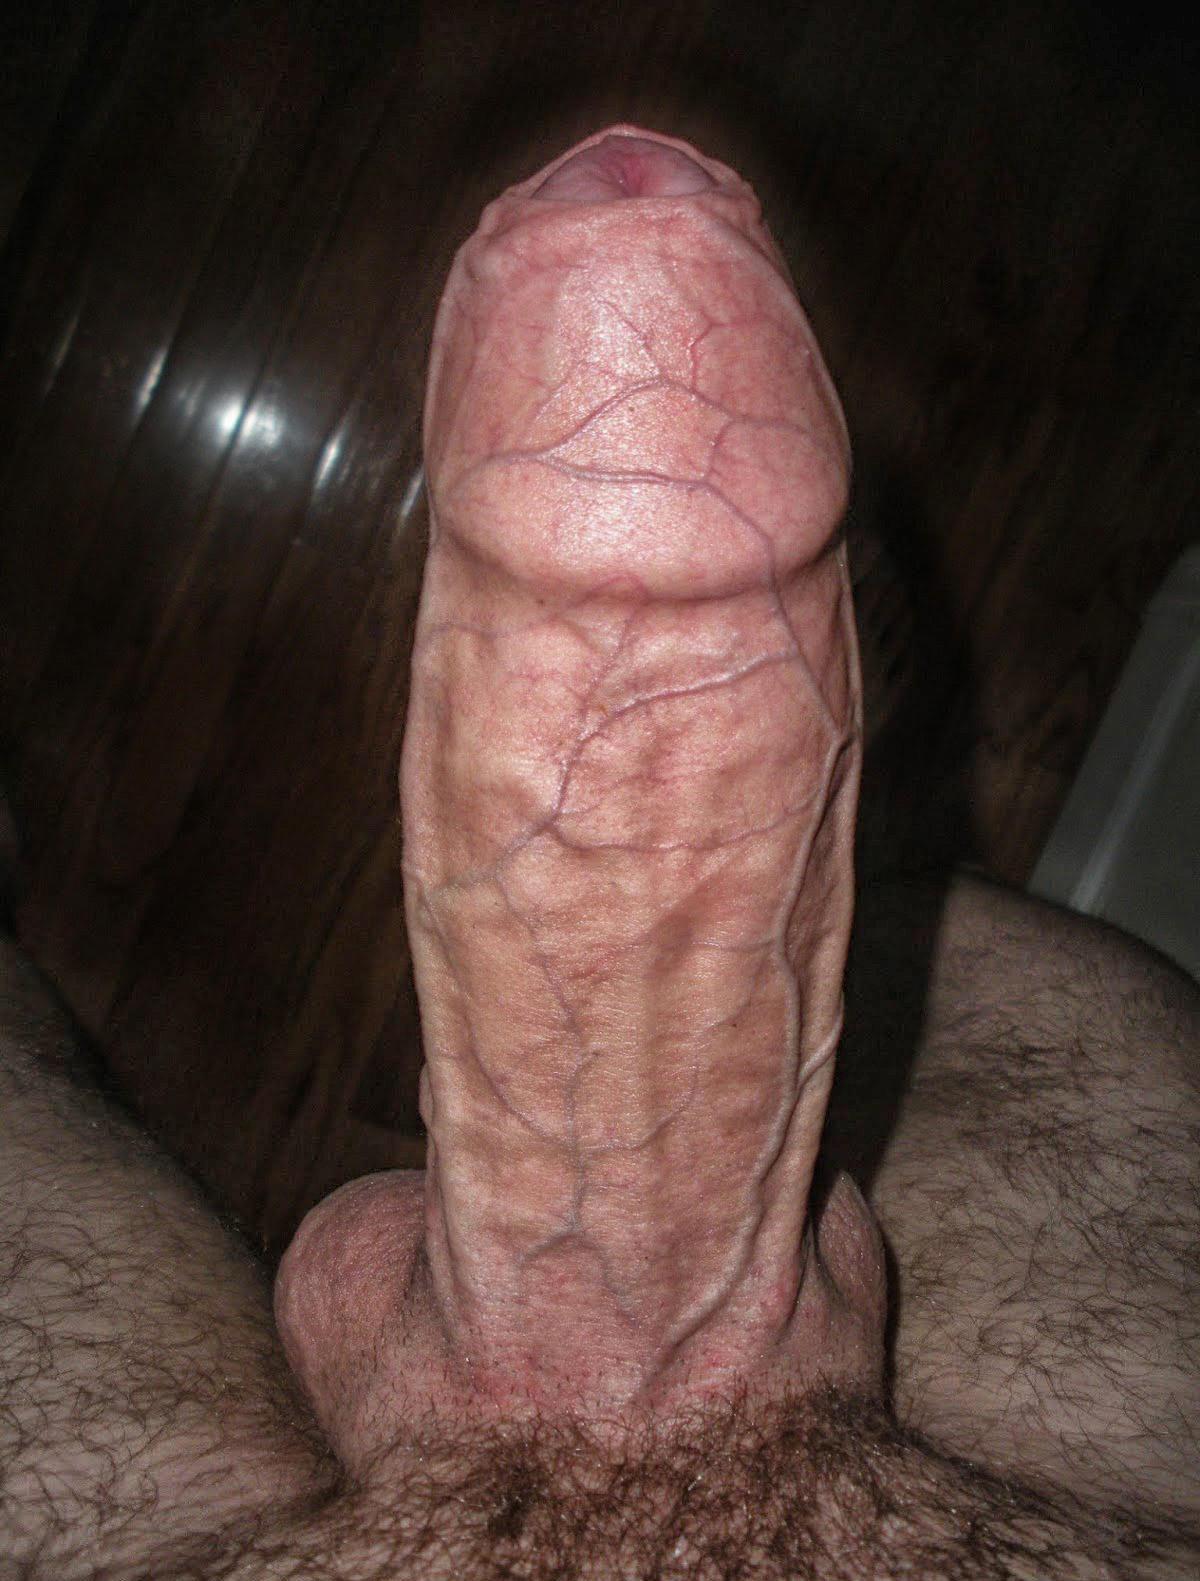 Amazing huge uncut cock shoot a load 1